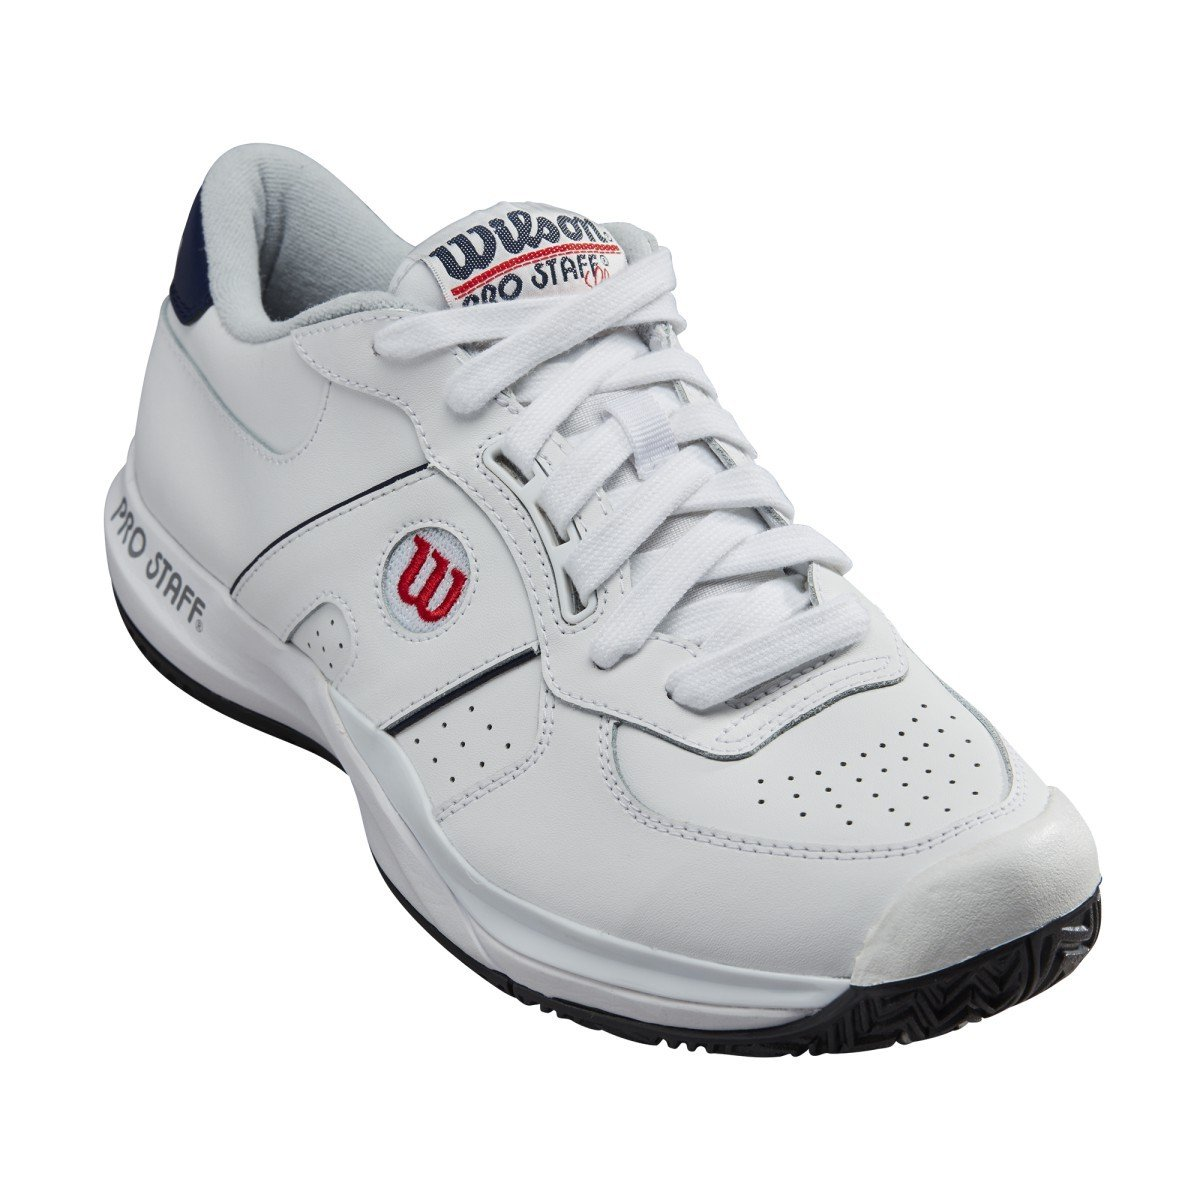 Wilson Tennis Shoes – Men's Pro Staff New York Edition